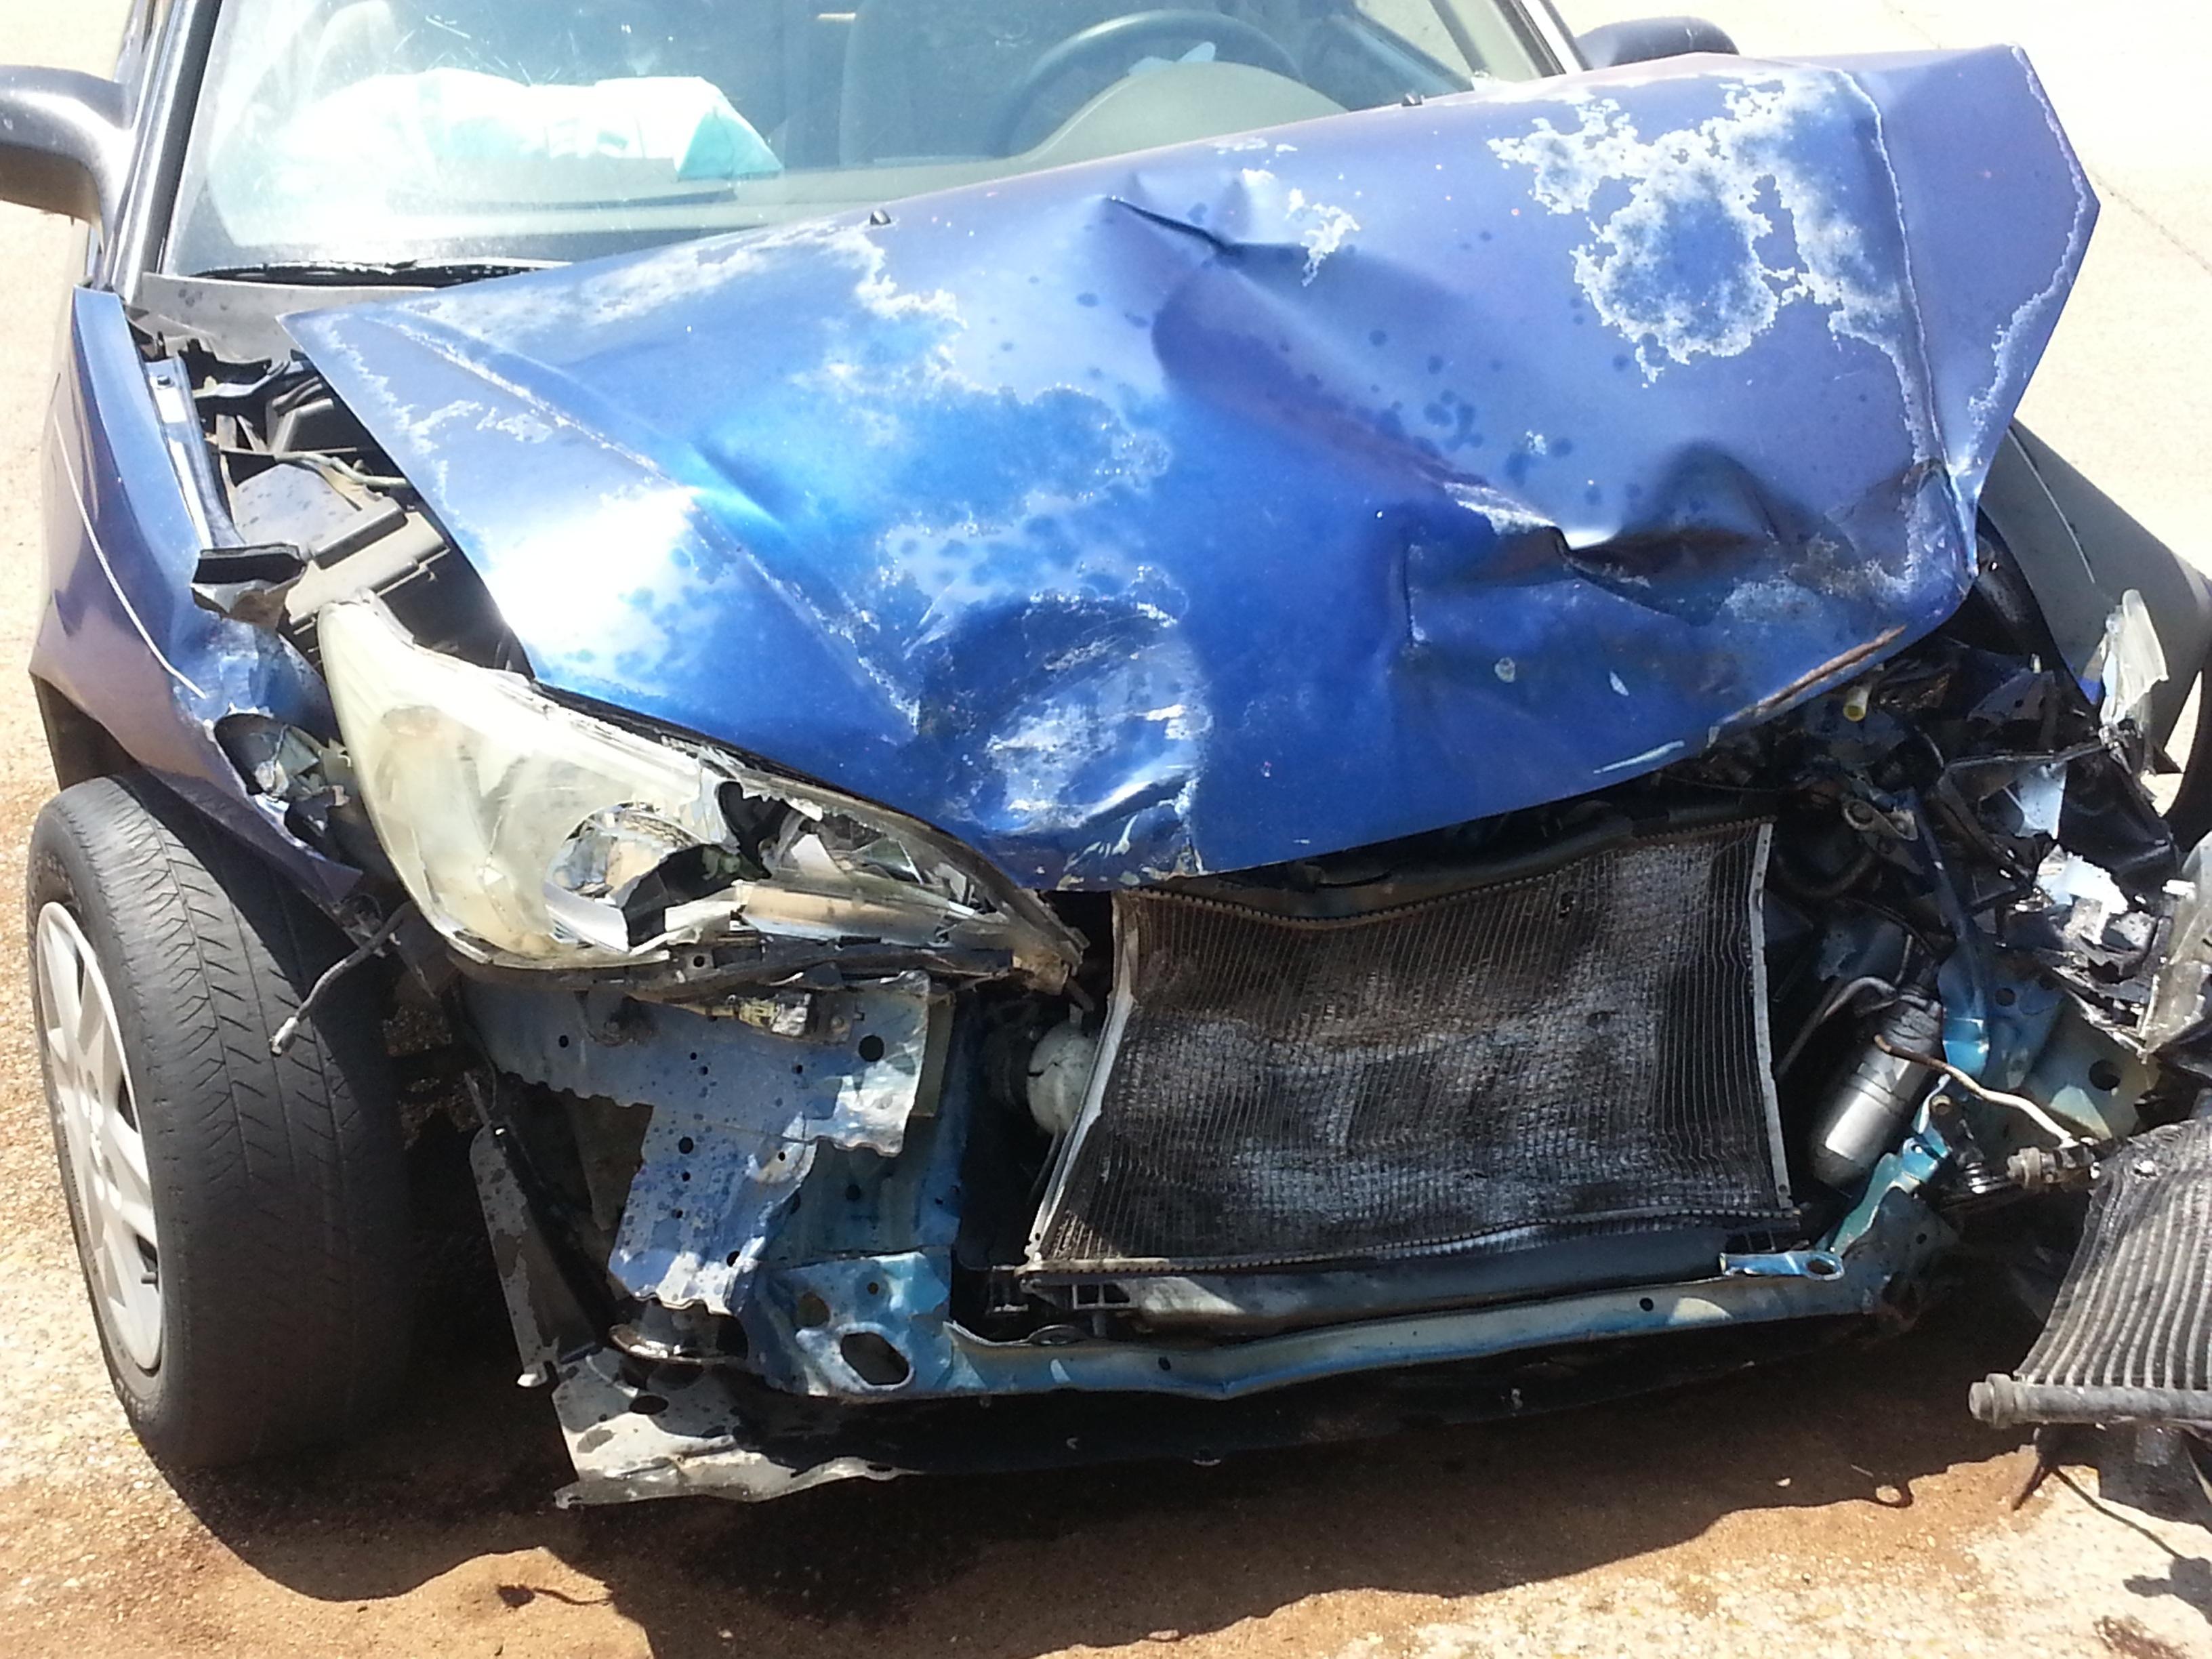 Free Images : traffic, wheel, window, crash, sports car, bumper ...